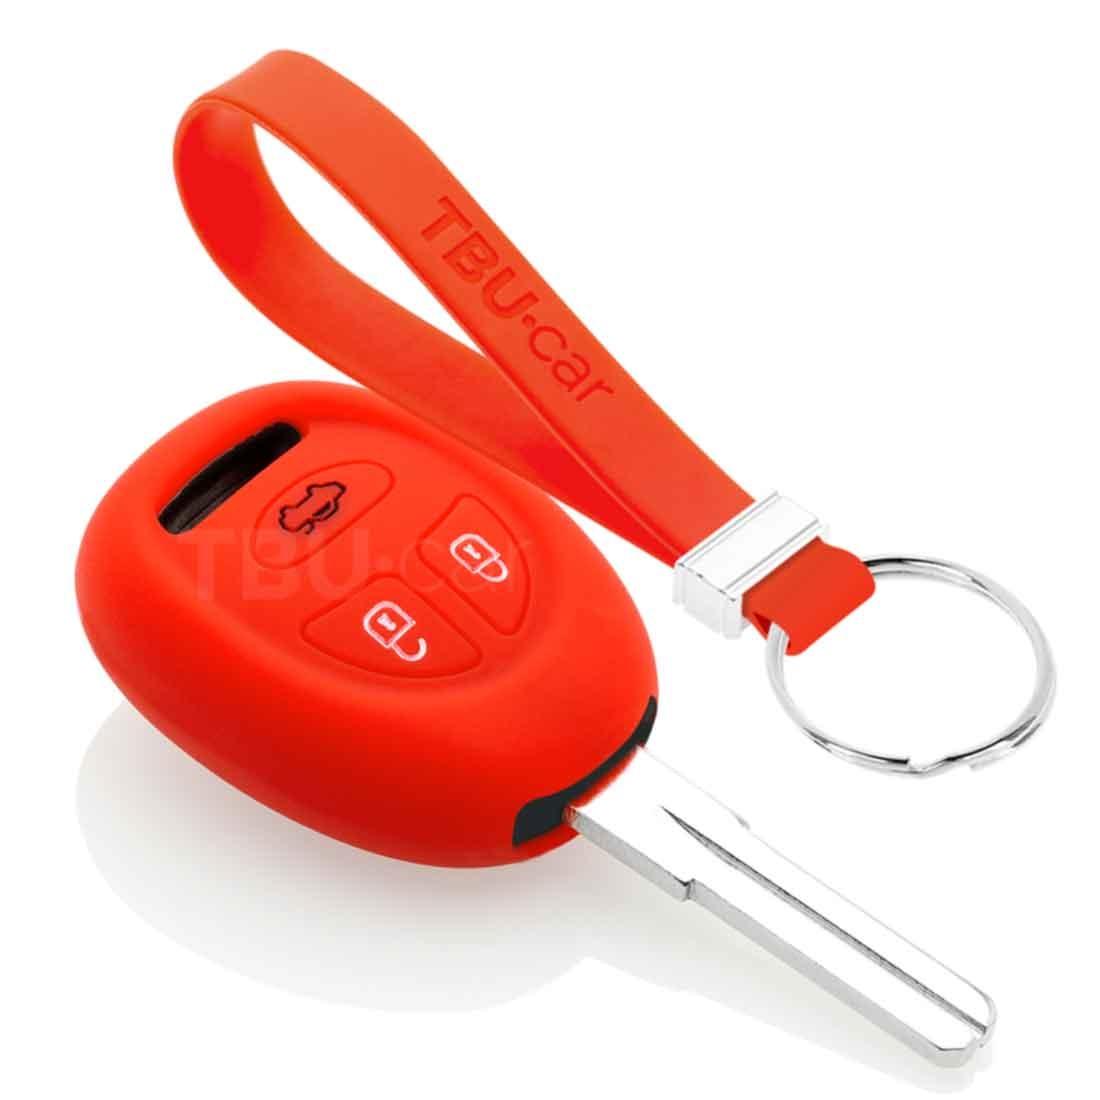 TBU car TBU car Sleutel cover compatibel met Saab - Silicone sleutelhoesje - beschermhoesje autosleutel - Rood